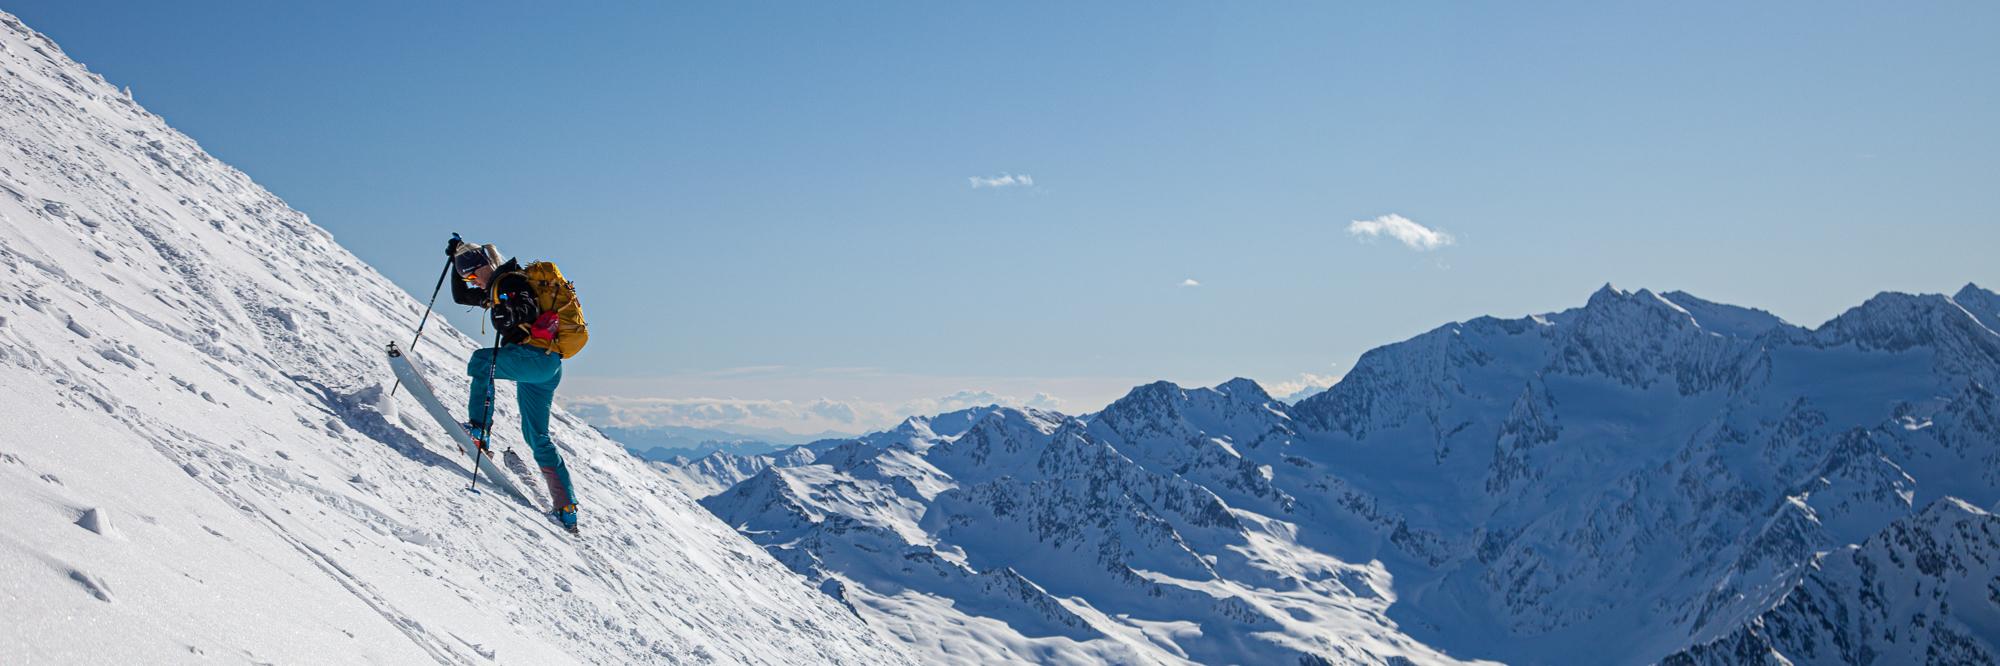 Skitouren in Südtirol statt in der Steiermark